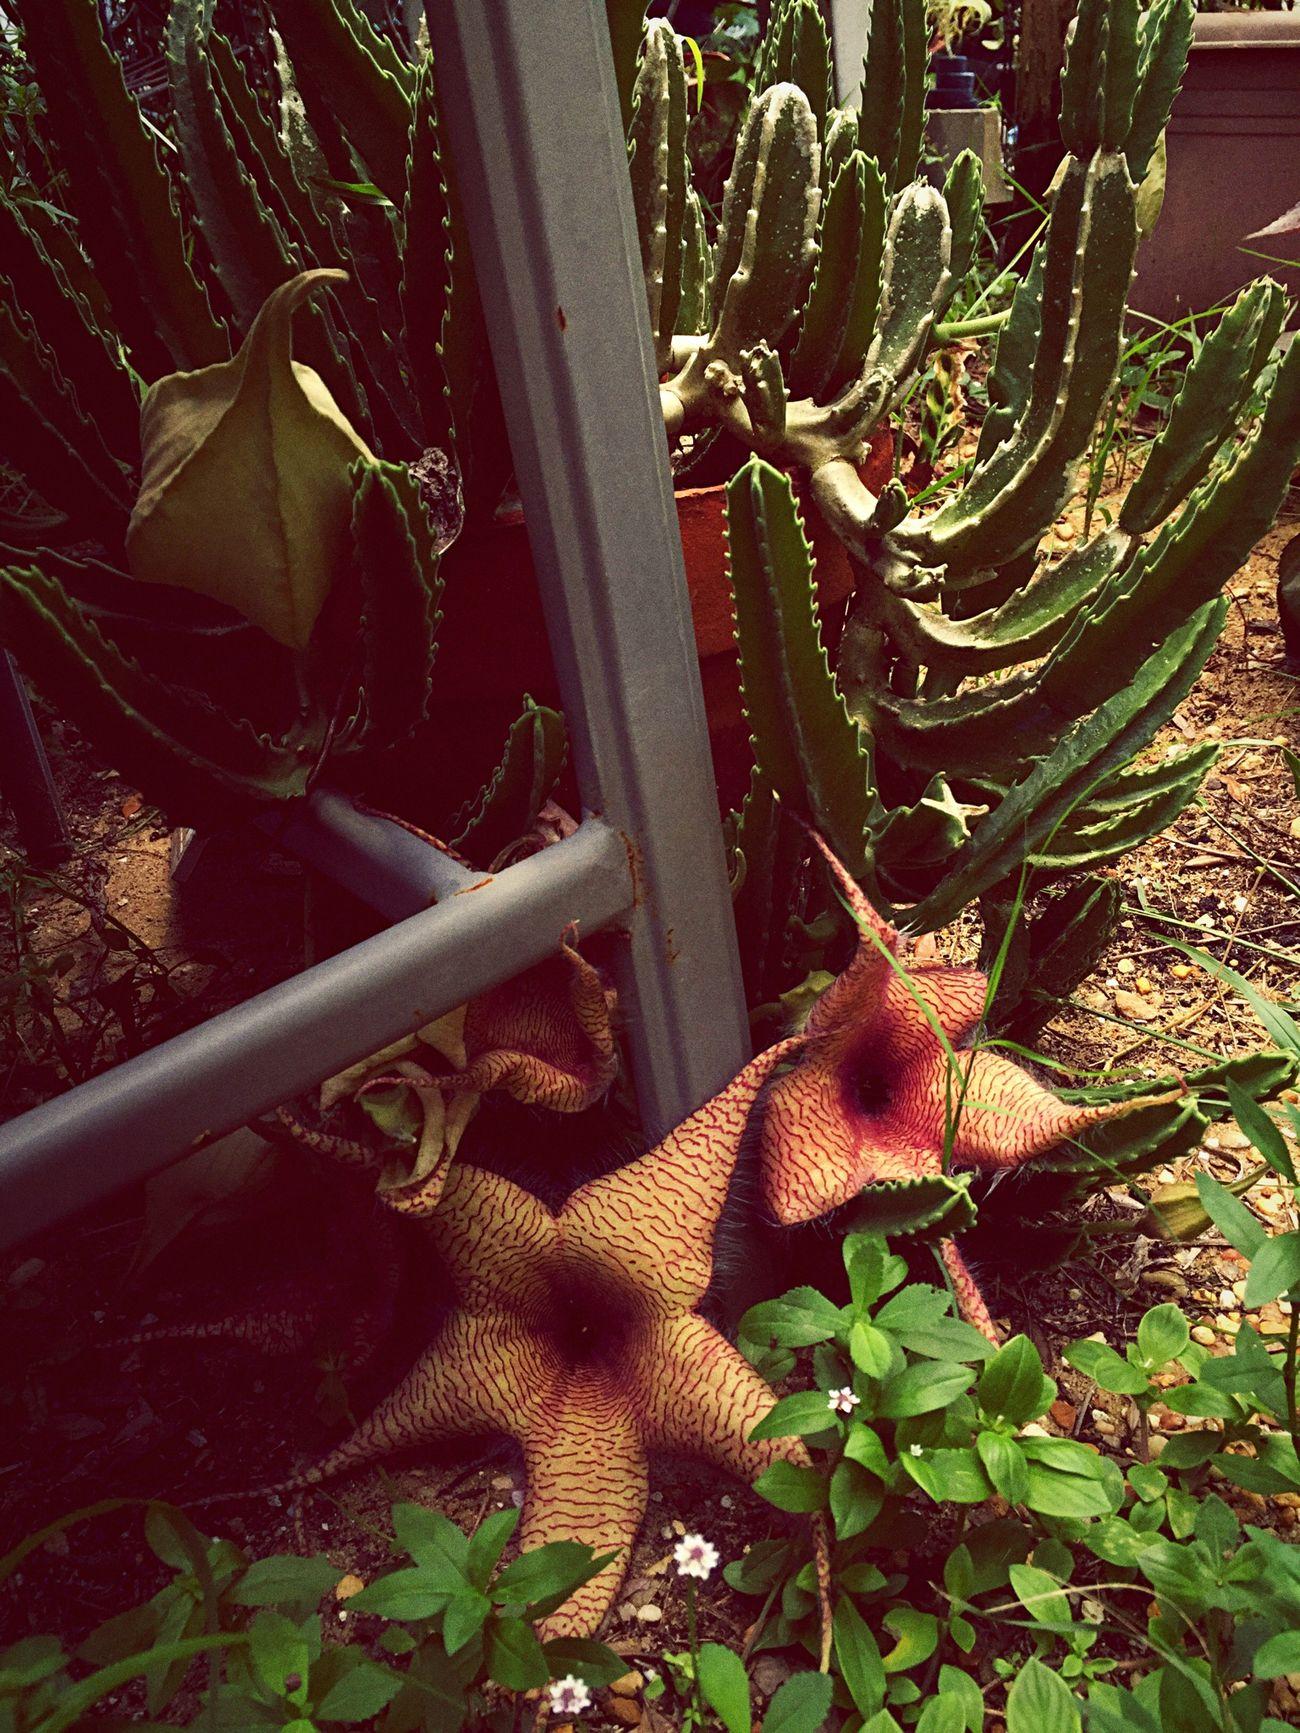 Doghairstudio In My Garden Gypsy Girl Creative Gardening